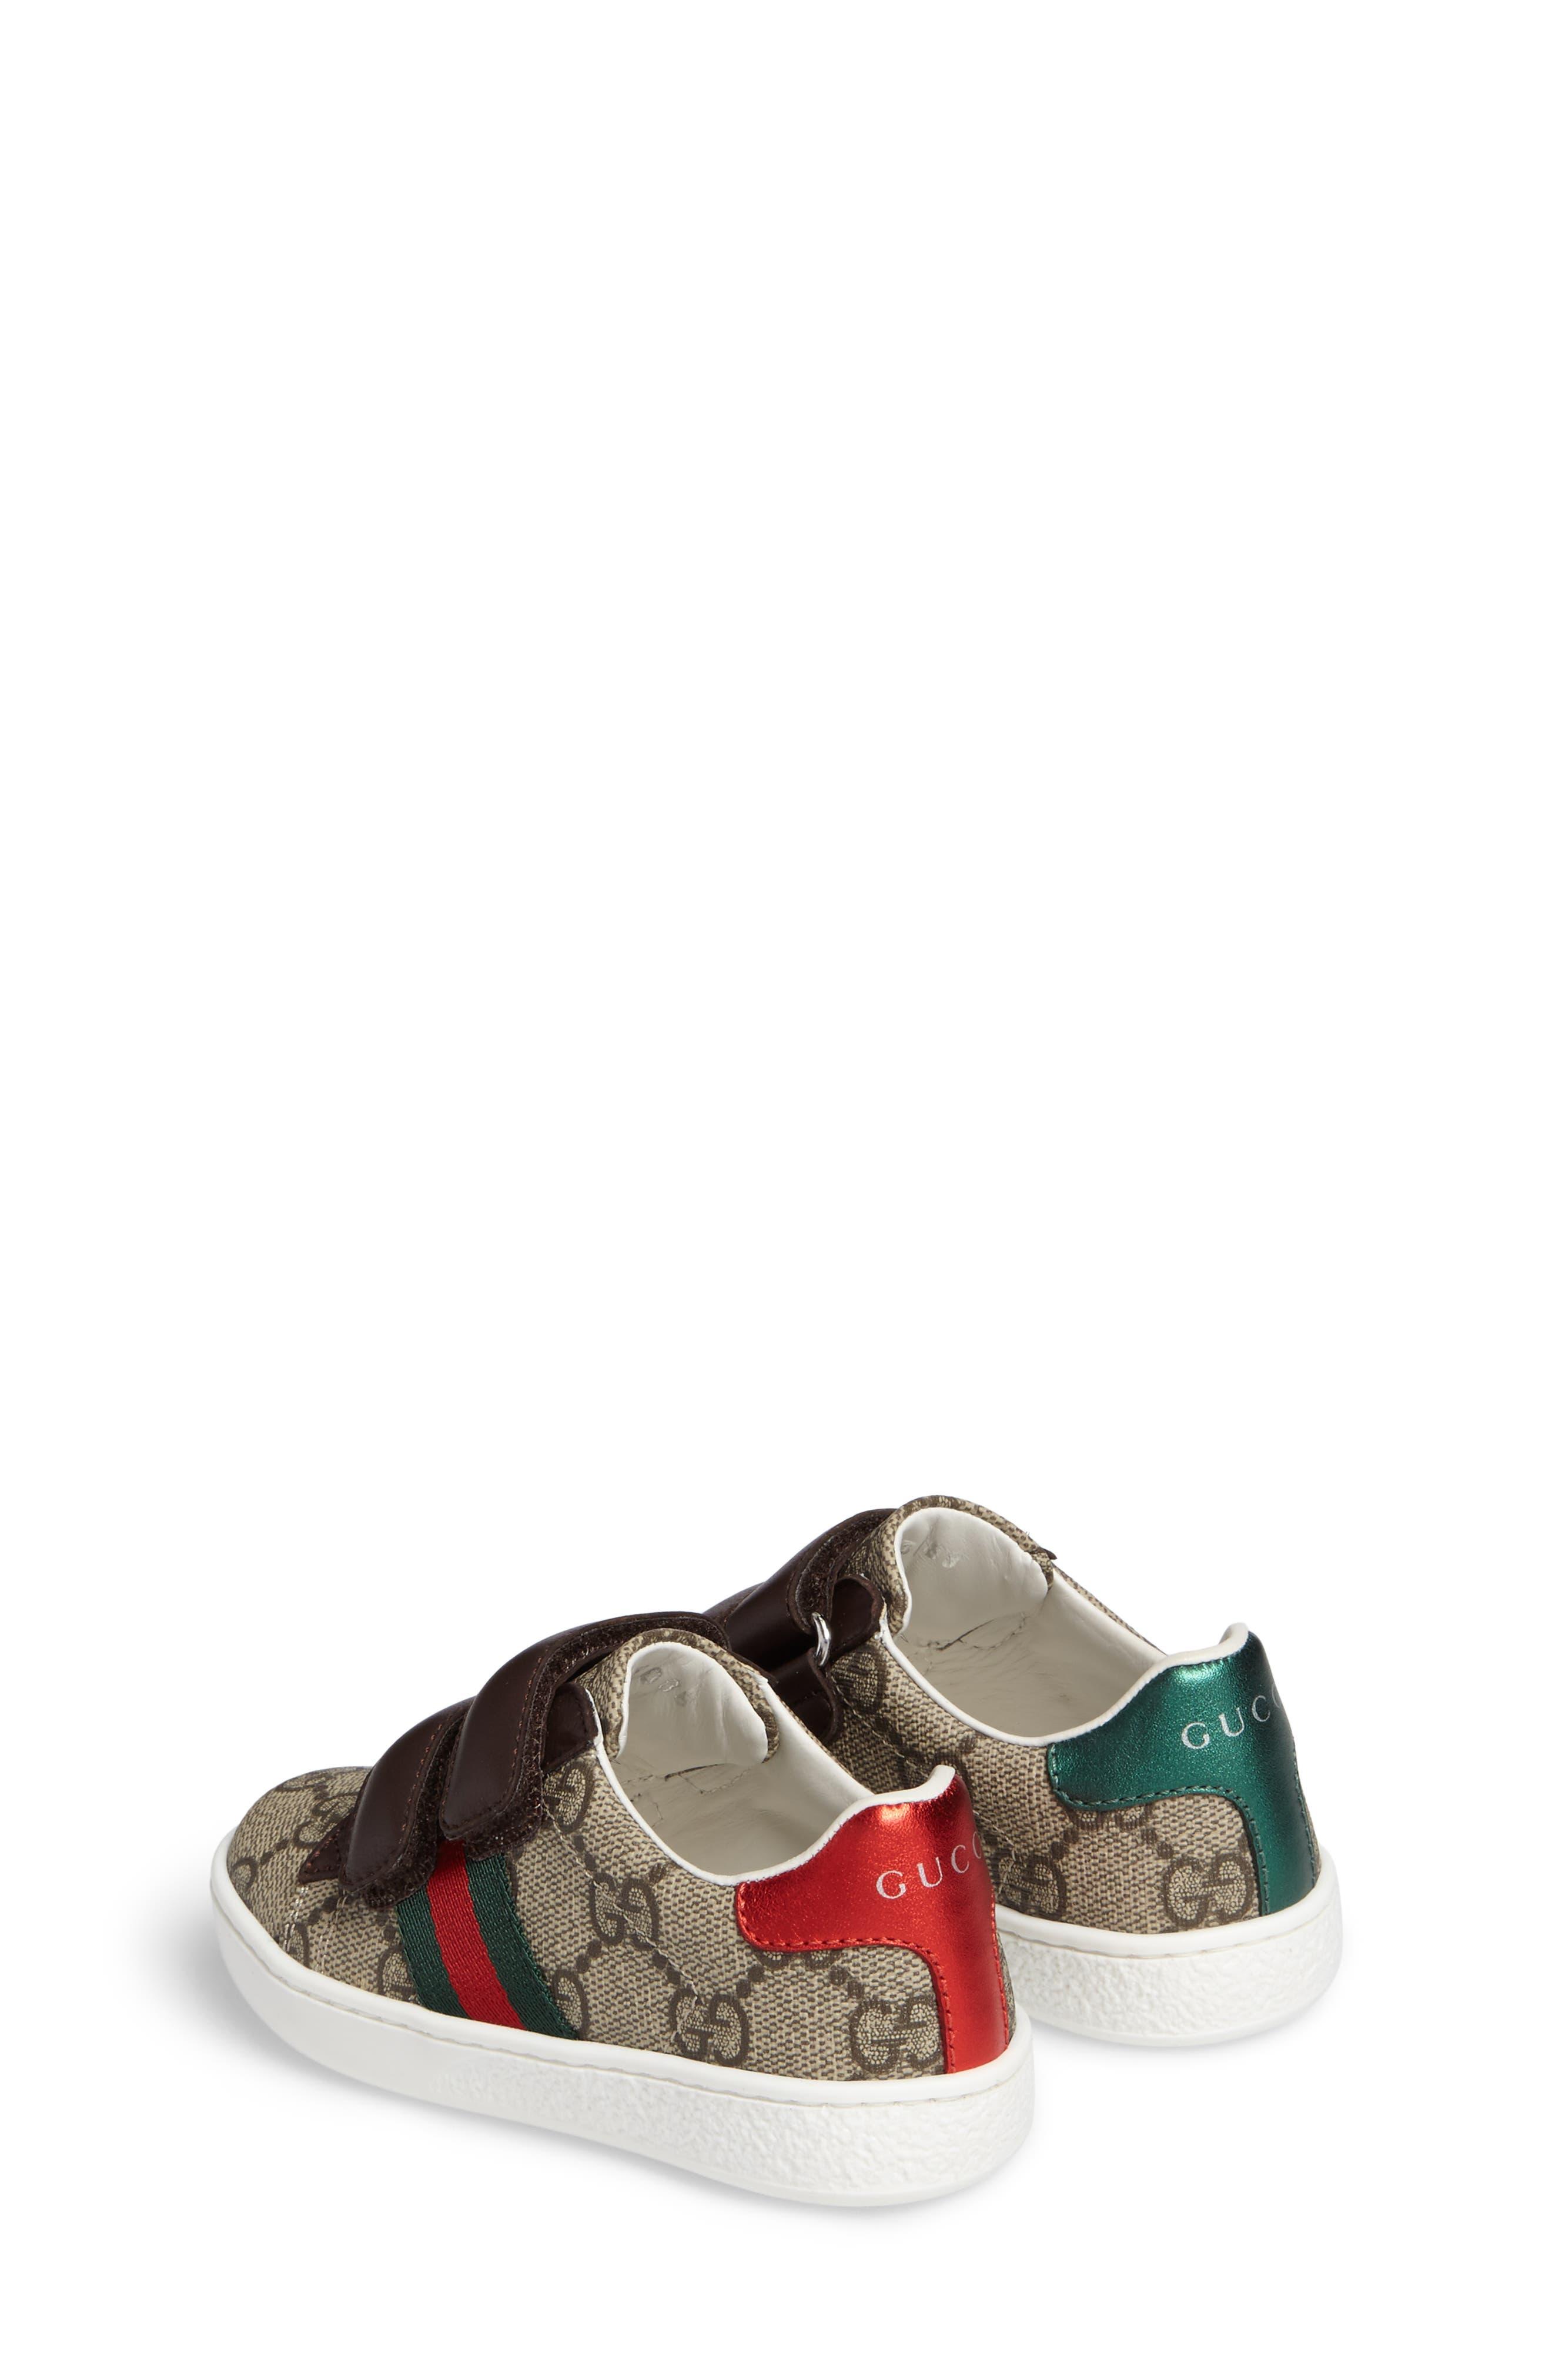 Alternate Image 3  - Gucci New Ace Monogram Sneaker (Baby, Walker, Toddler, Little Kid & Big Kid)